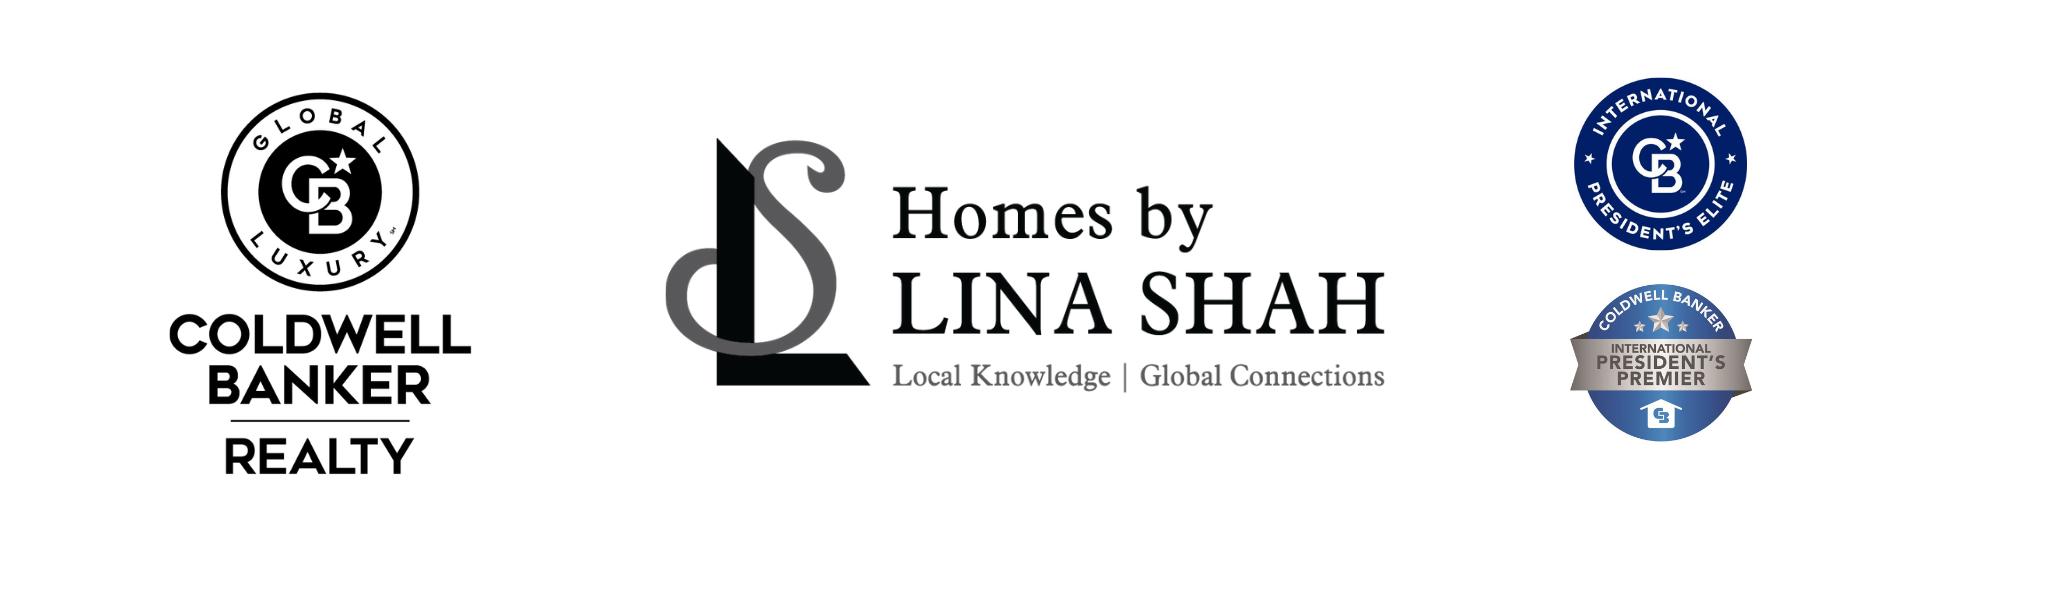 Linas logos and awars